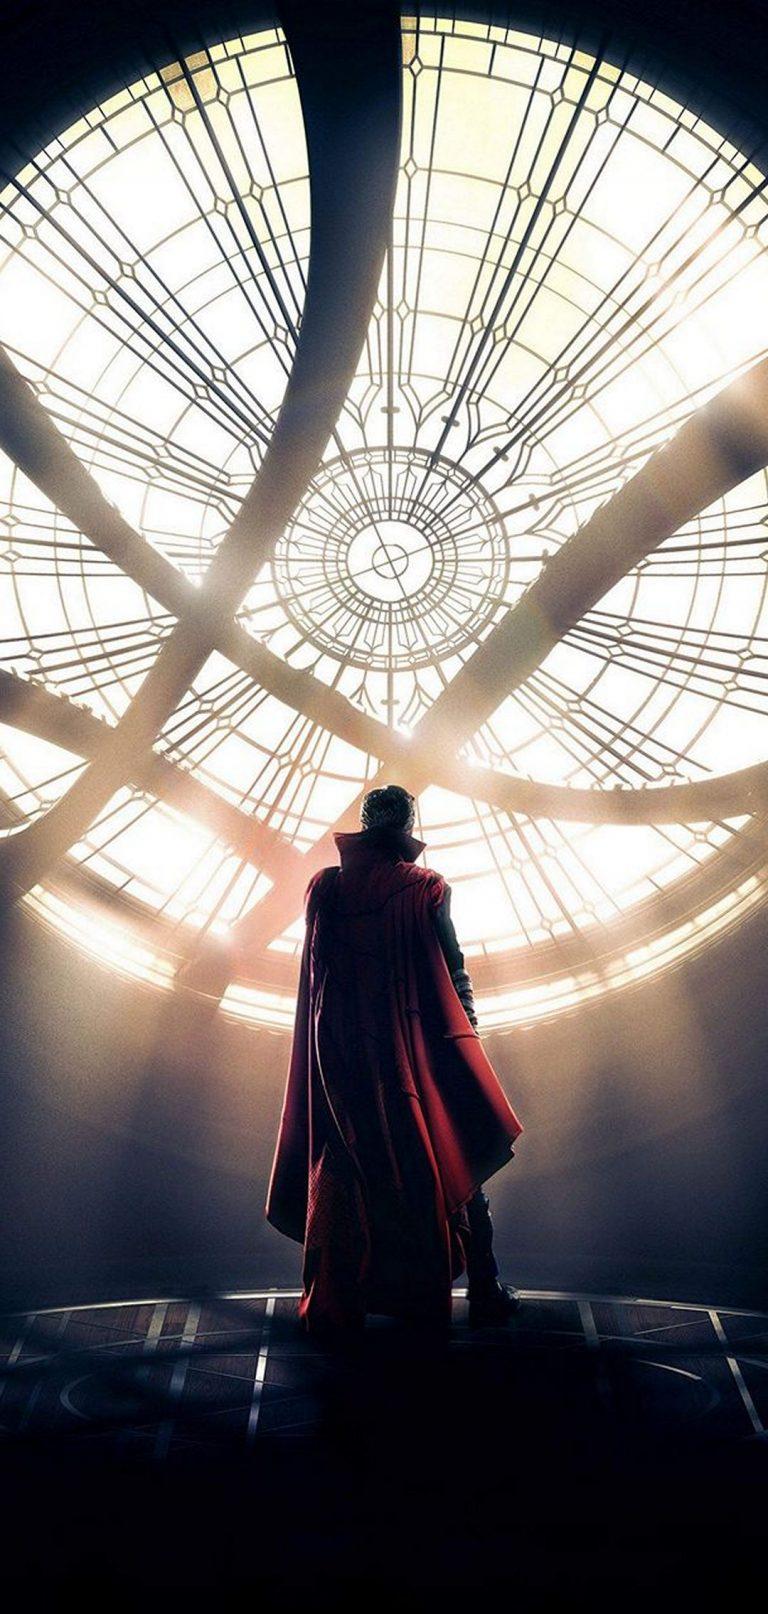 Doctor Strange Superhero 1080x2270 768x1614